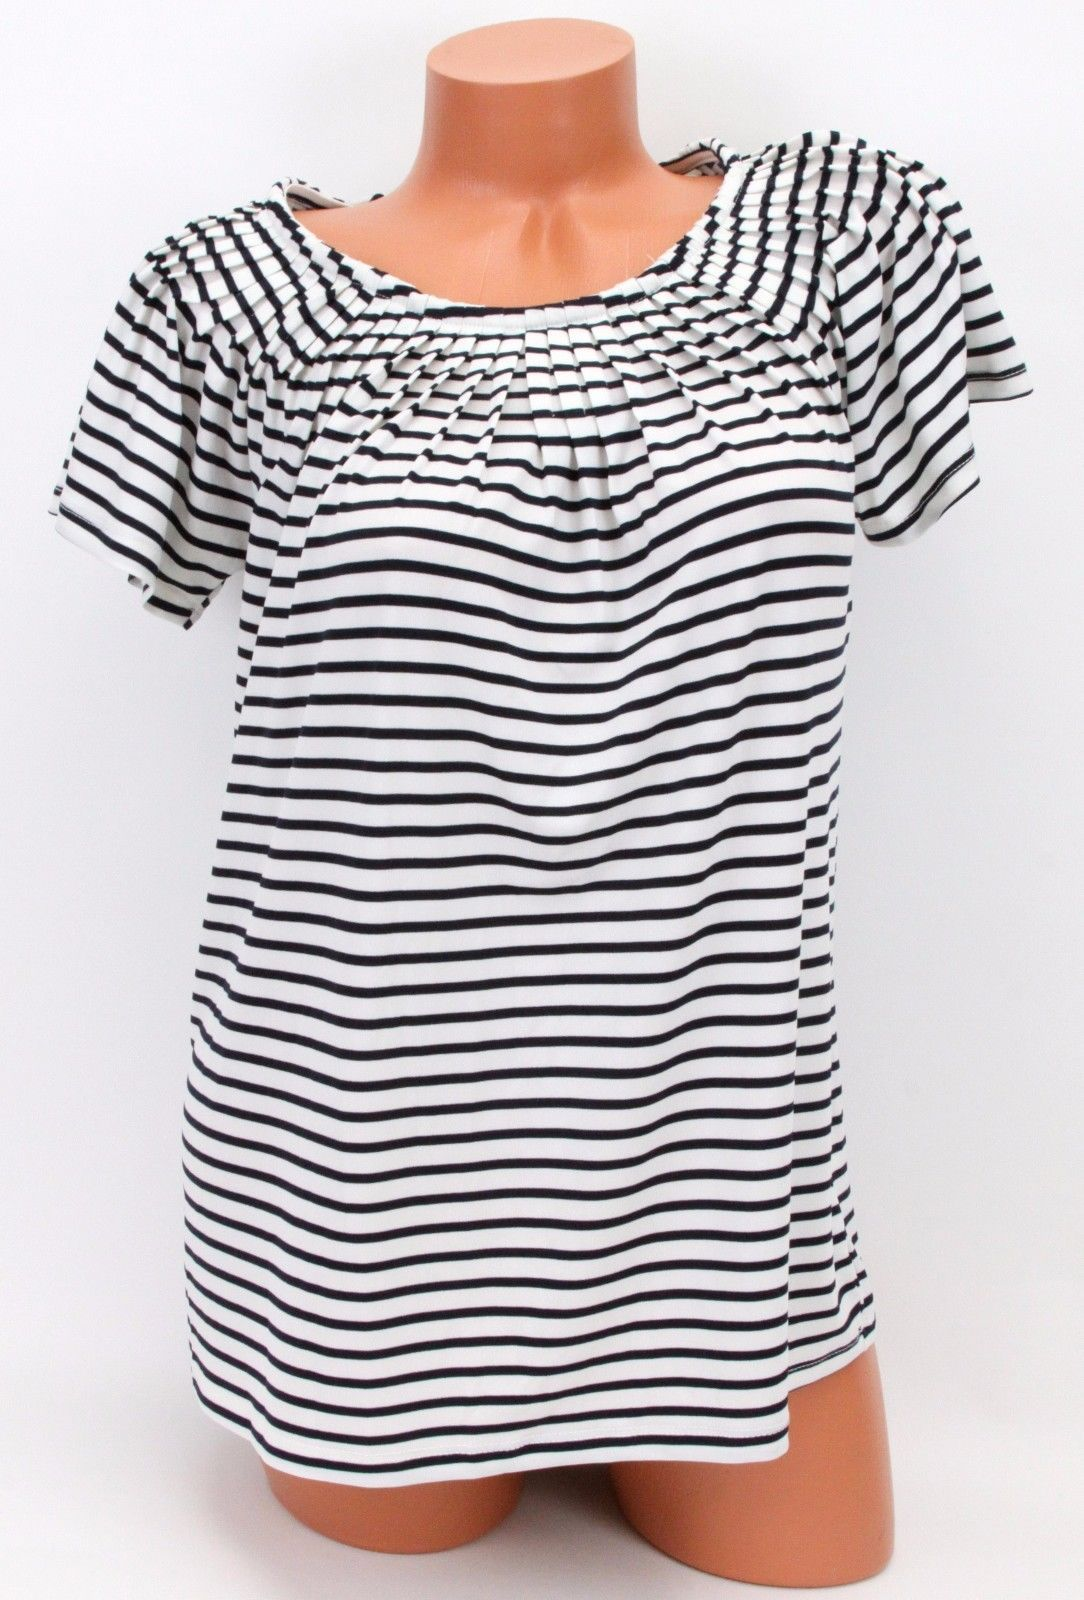 Styleco. Pleat-Neck Printed Top Black & White Stripe Small NWT